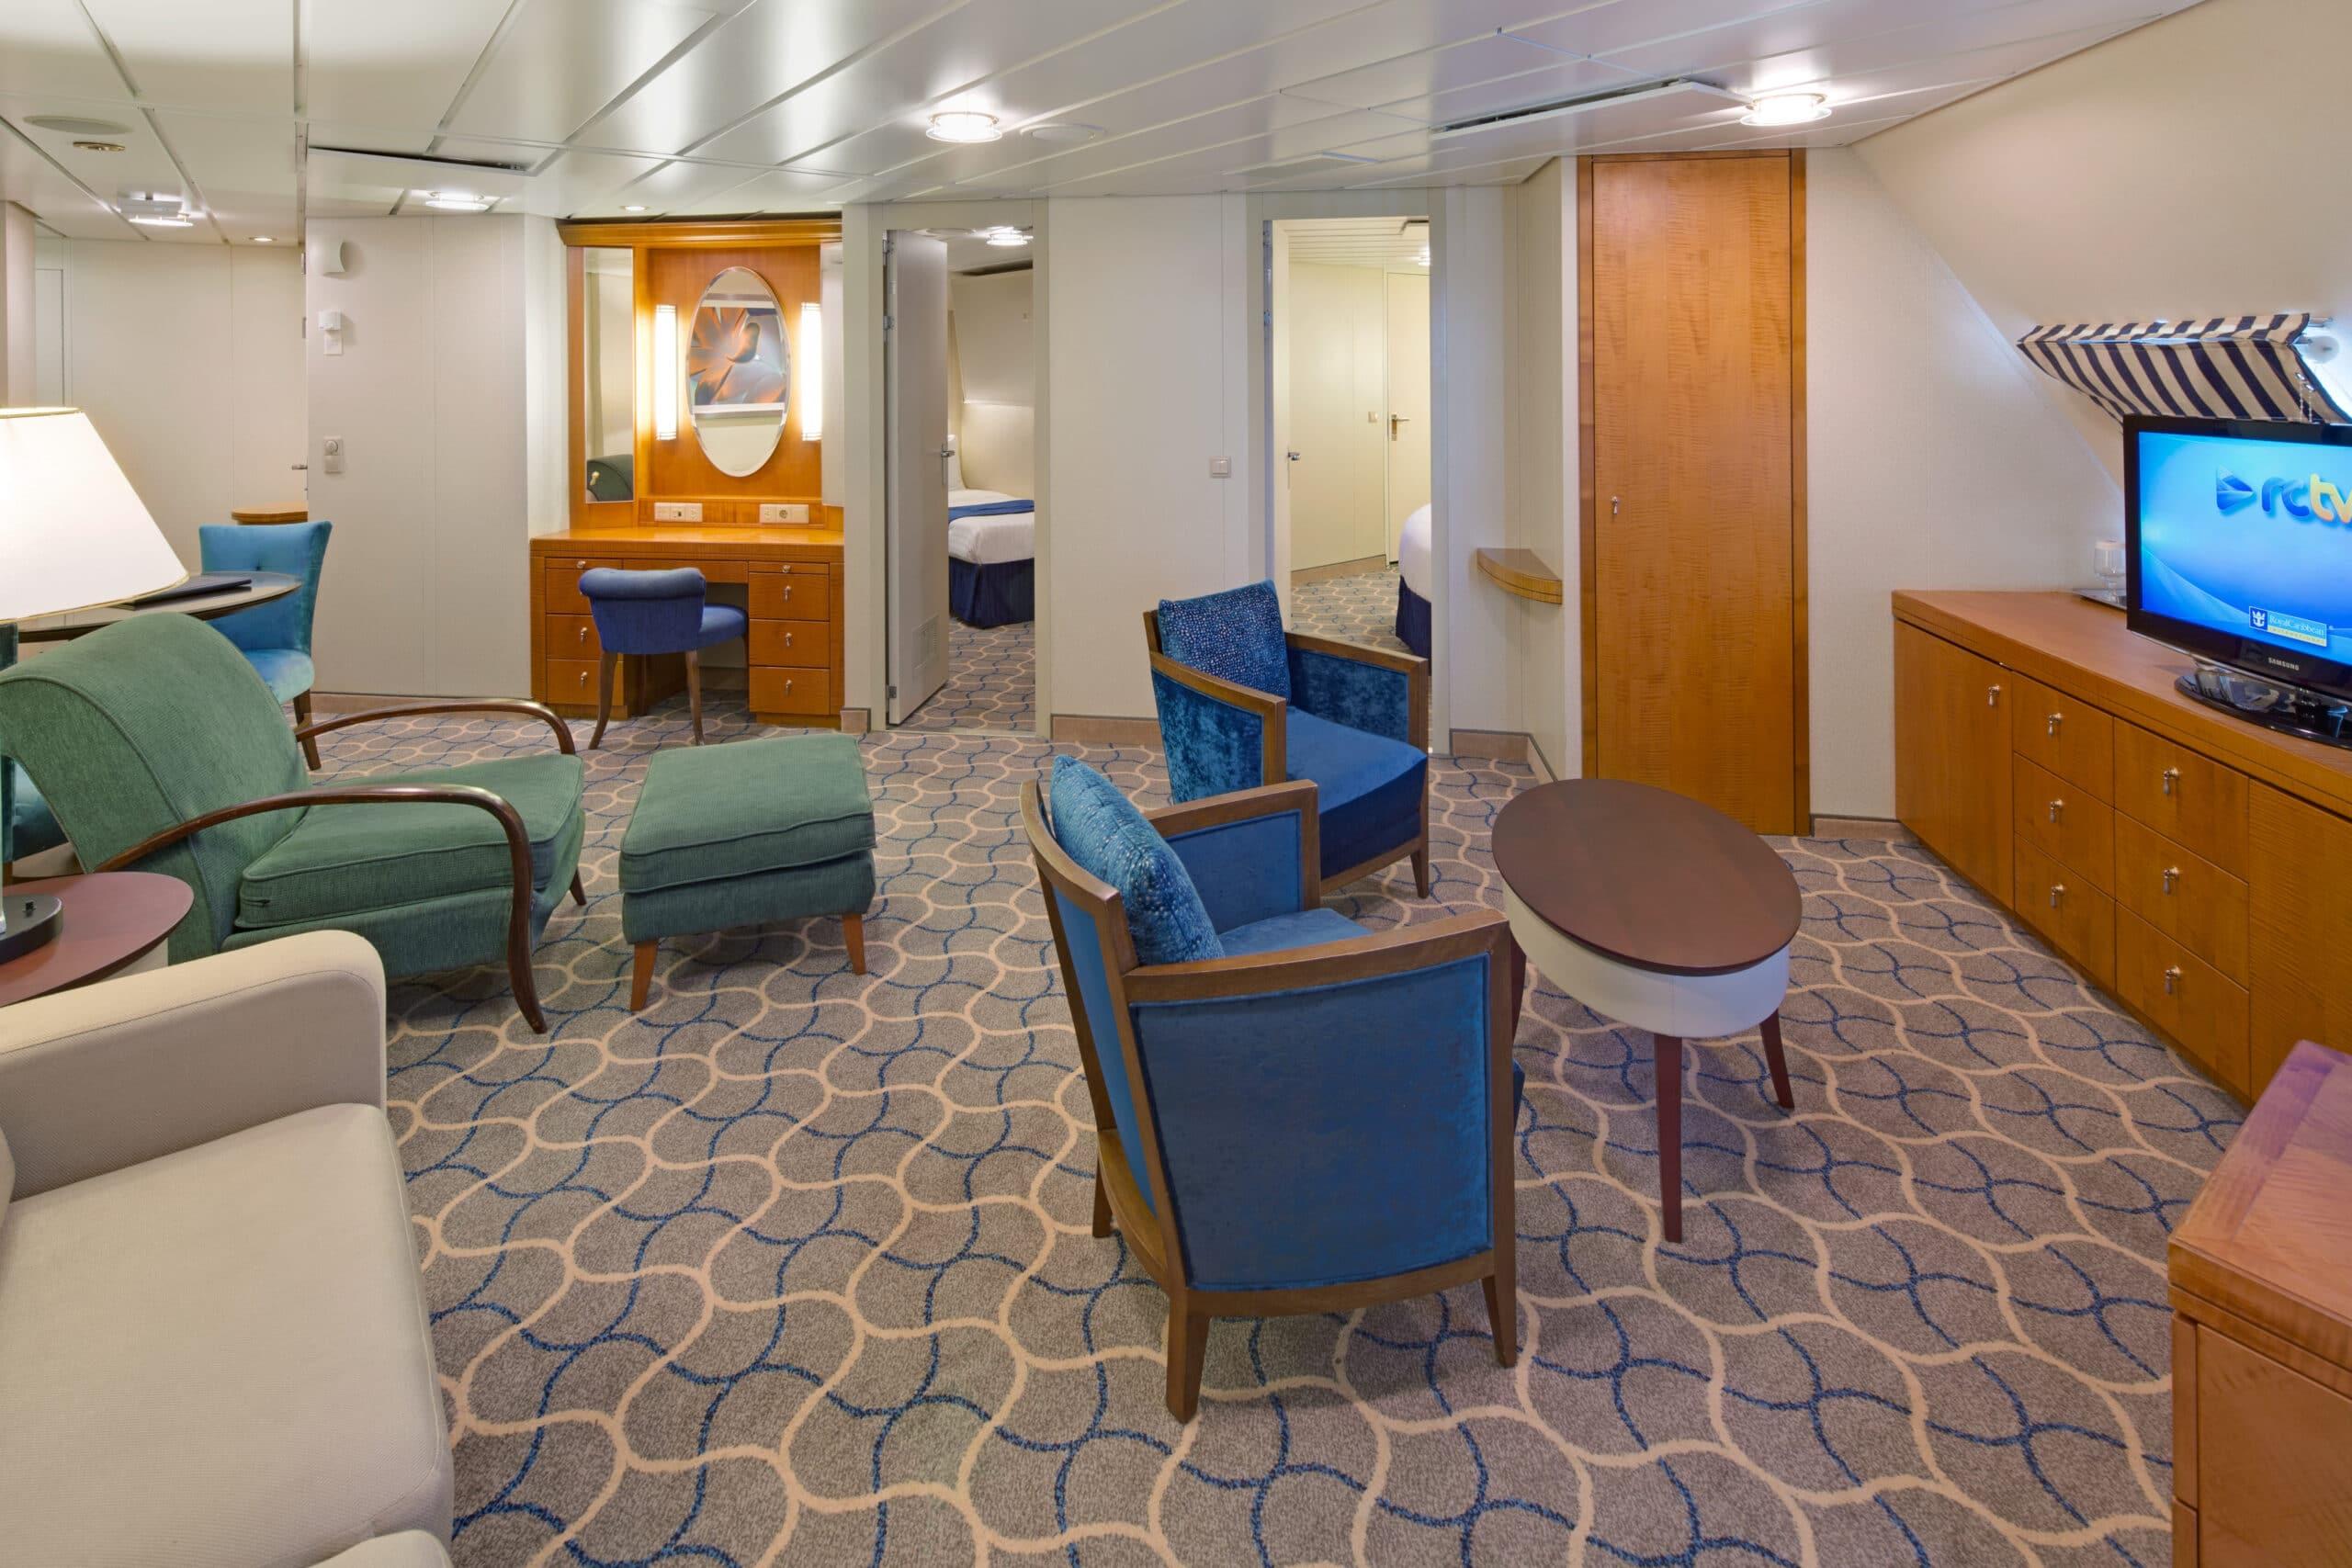 Royal-Caribbean-International-Jewel-of-the-Seas-schip-cruiseschip-categorie-OT-Owner-Suite-2-bedroom